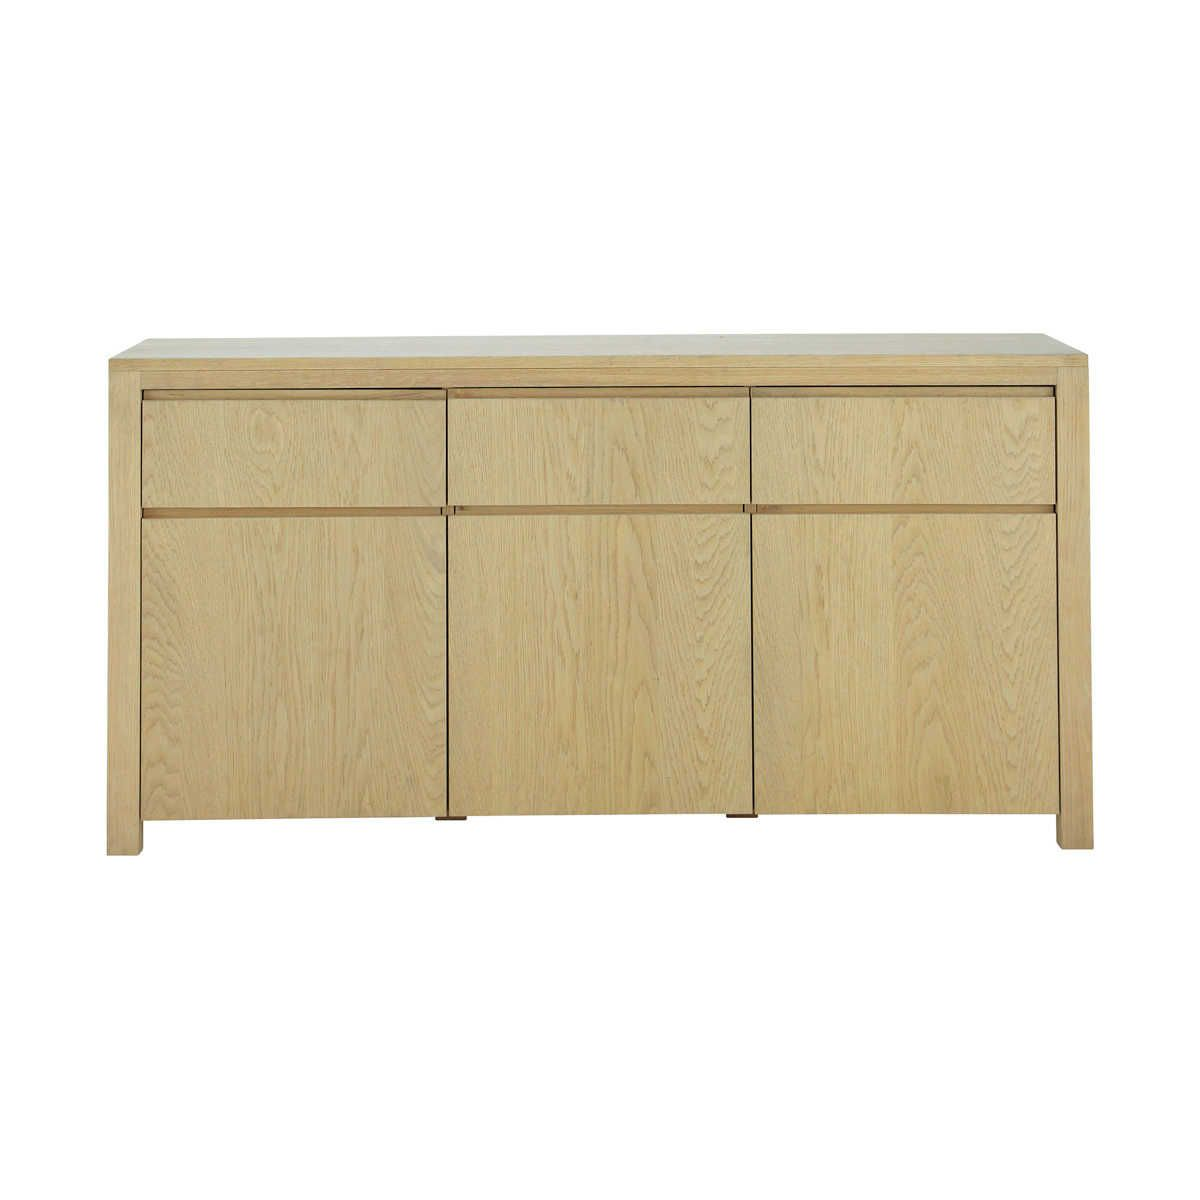 Buffet 3 Portes L150 Salons Buffet Affordable Furniture